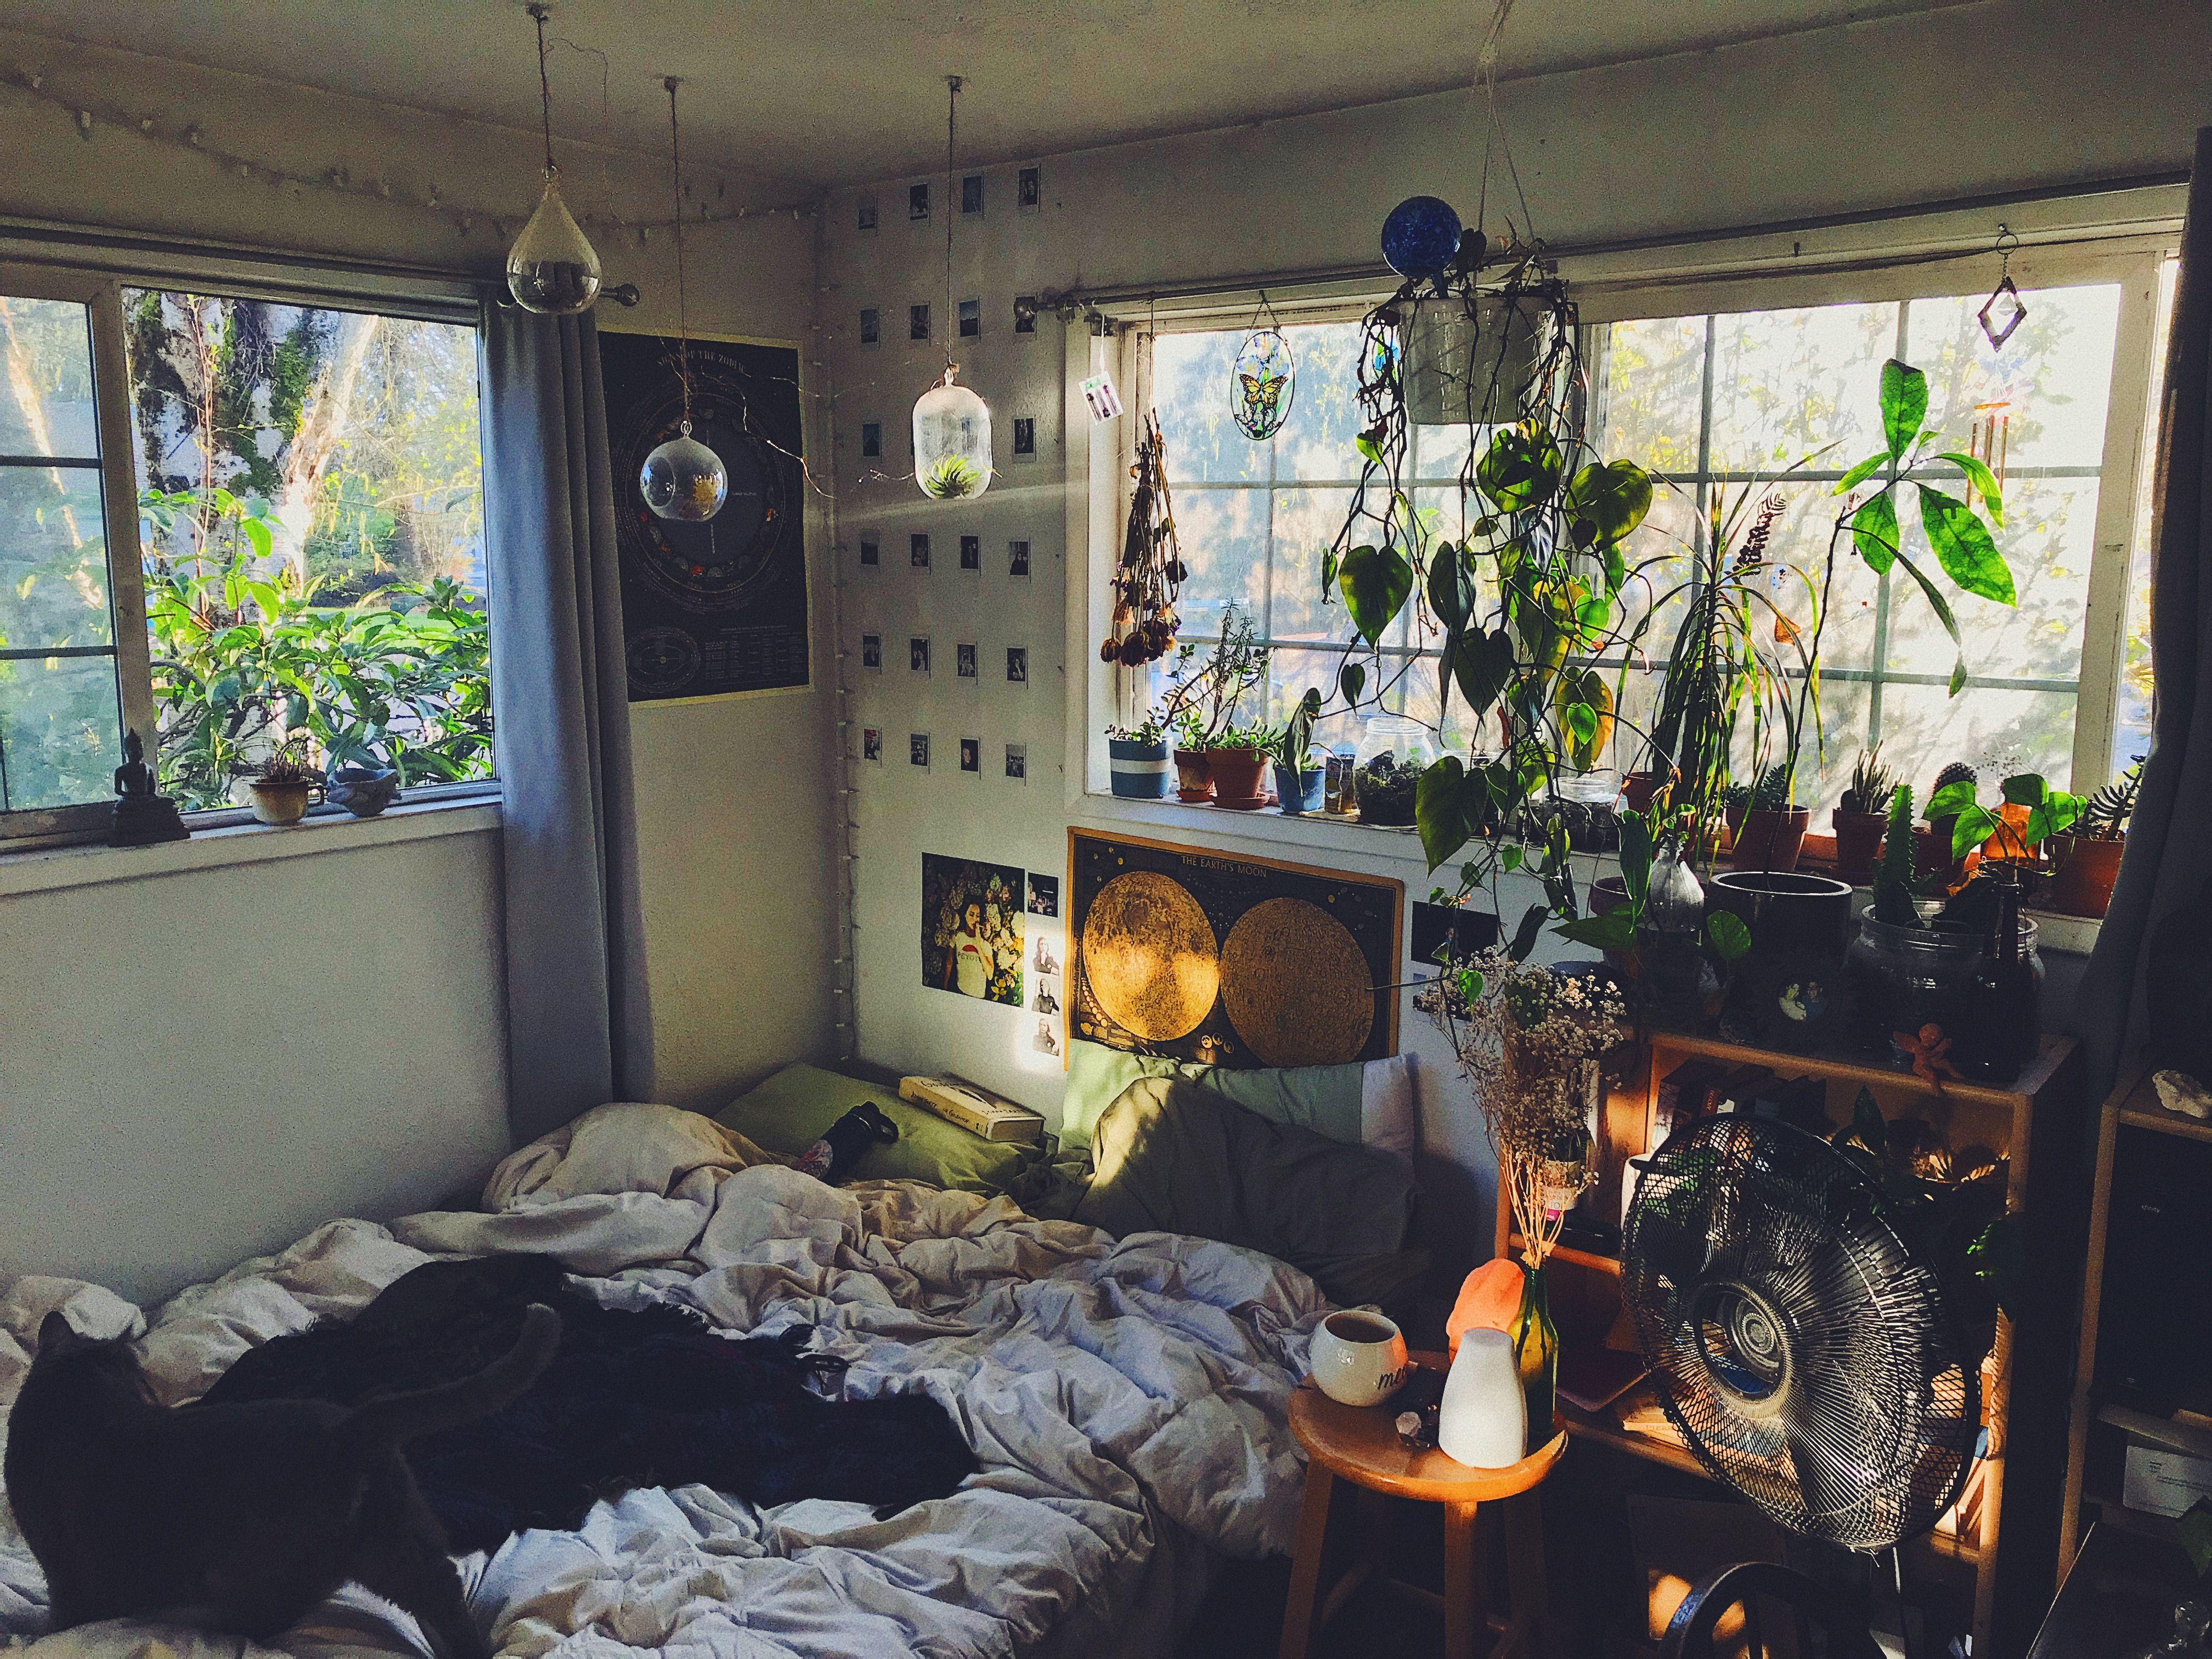 Aesthetic Room Room Inspiration Bedroom Aesthetic Bedroom Bedroom Decor Design Miscellaneous vintage bedroom decor